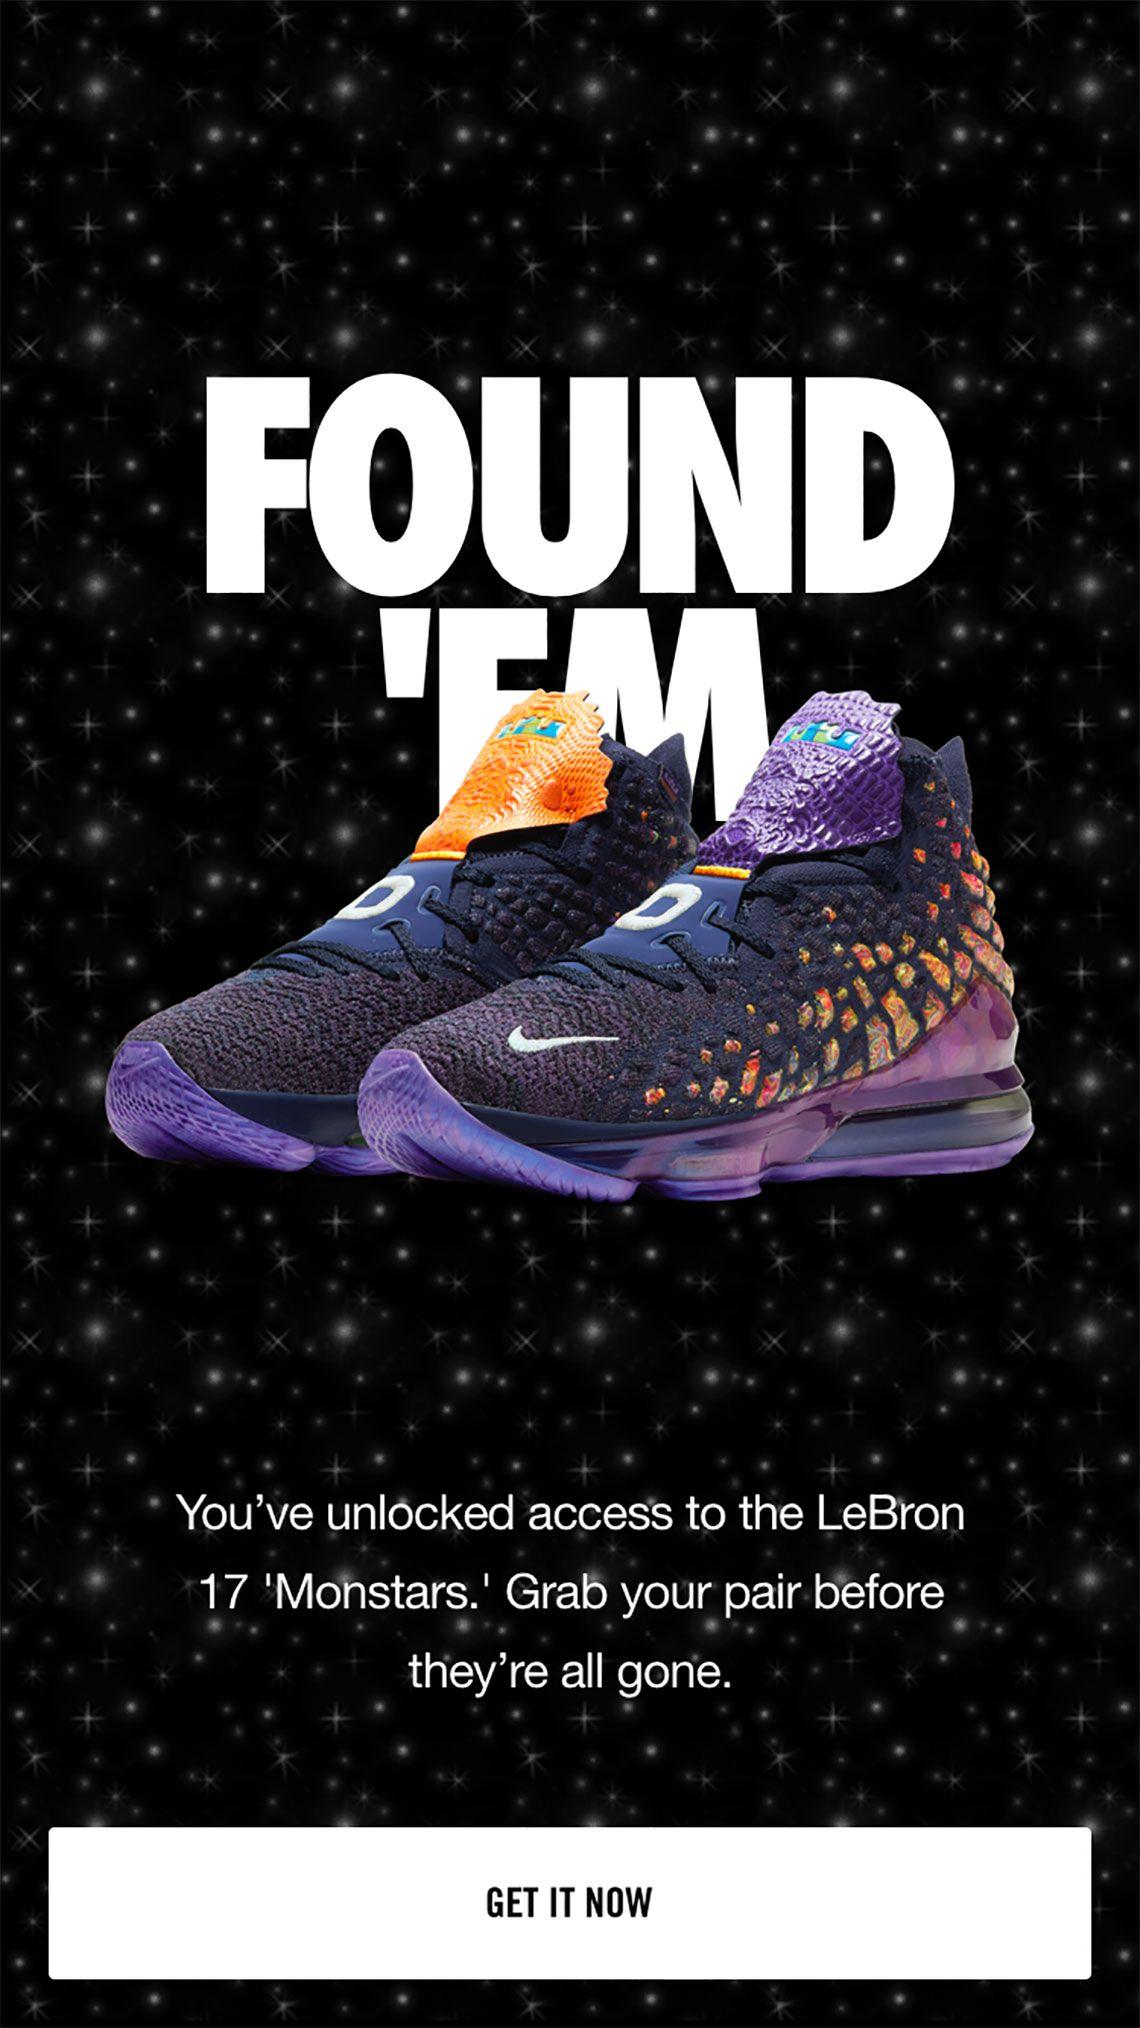 Nike Lebron 17 Monstars Cd5050 400 Release Date Sneakernews Com In 2020 Lebron 17 Nike Lebron Nike